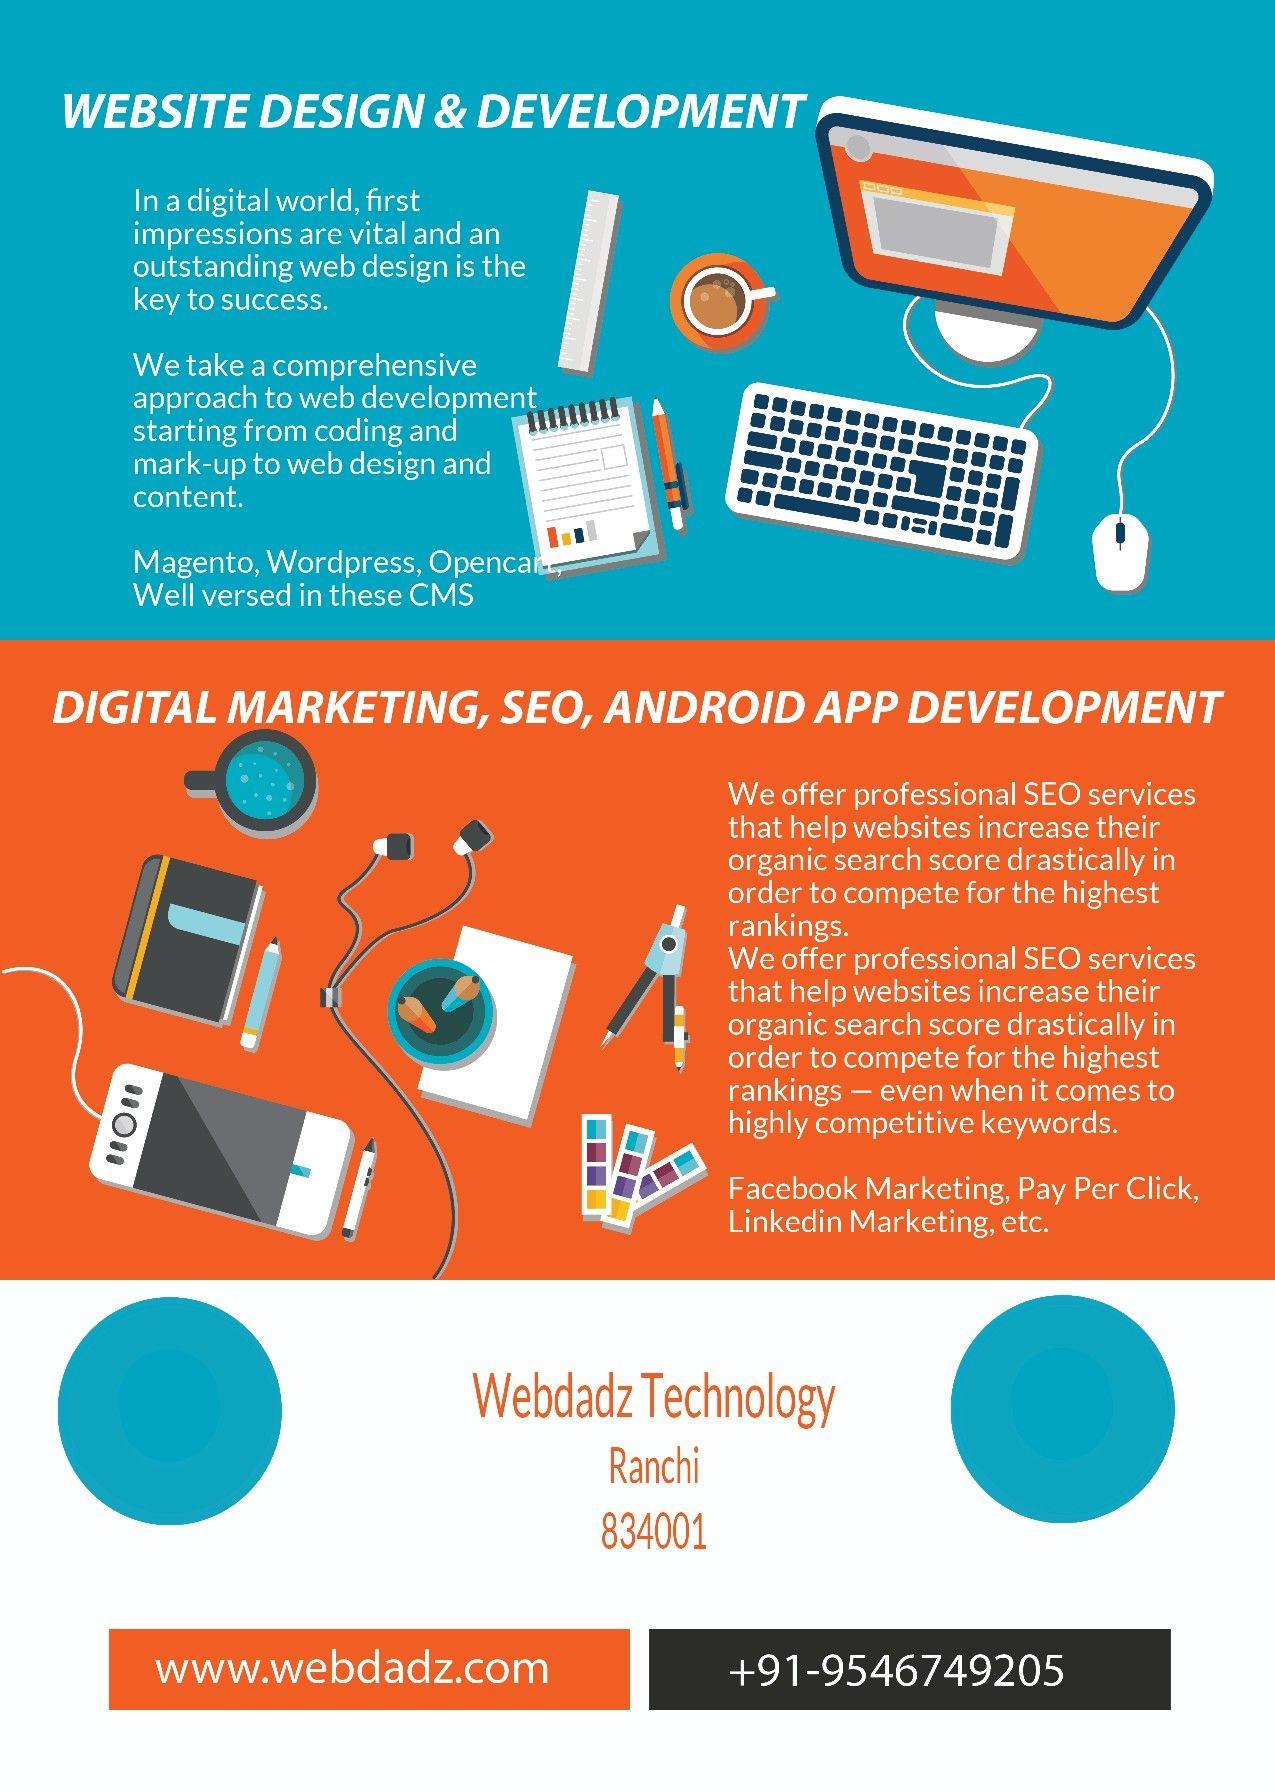 Best Website Design In Ranchi Seo In Ranchi Digital Marketing In Ranchi Android Fun Website Design Website Design Android Application Development